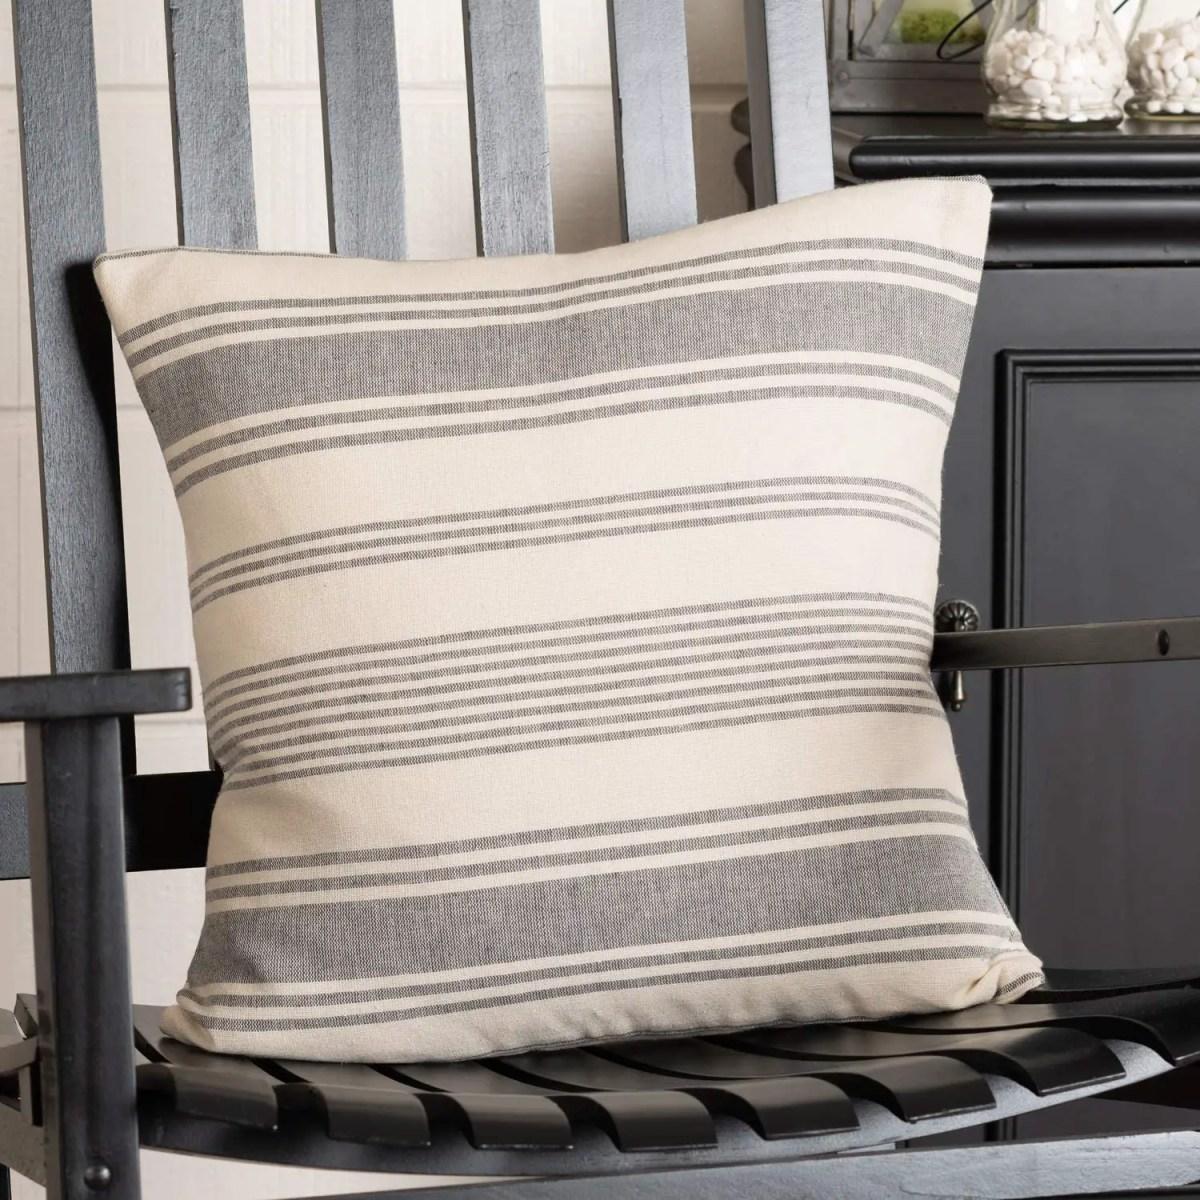 Striped-Accent-Farmhouse-Pillowcase